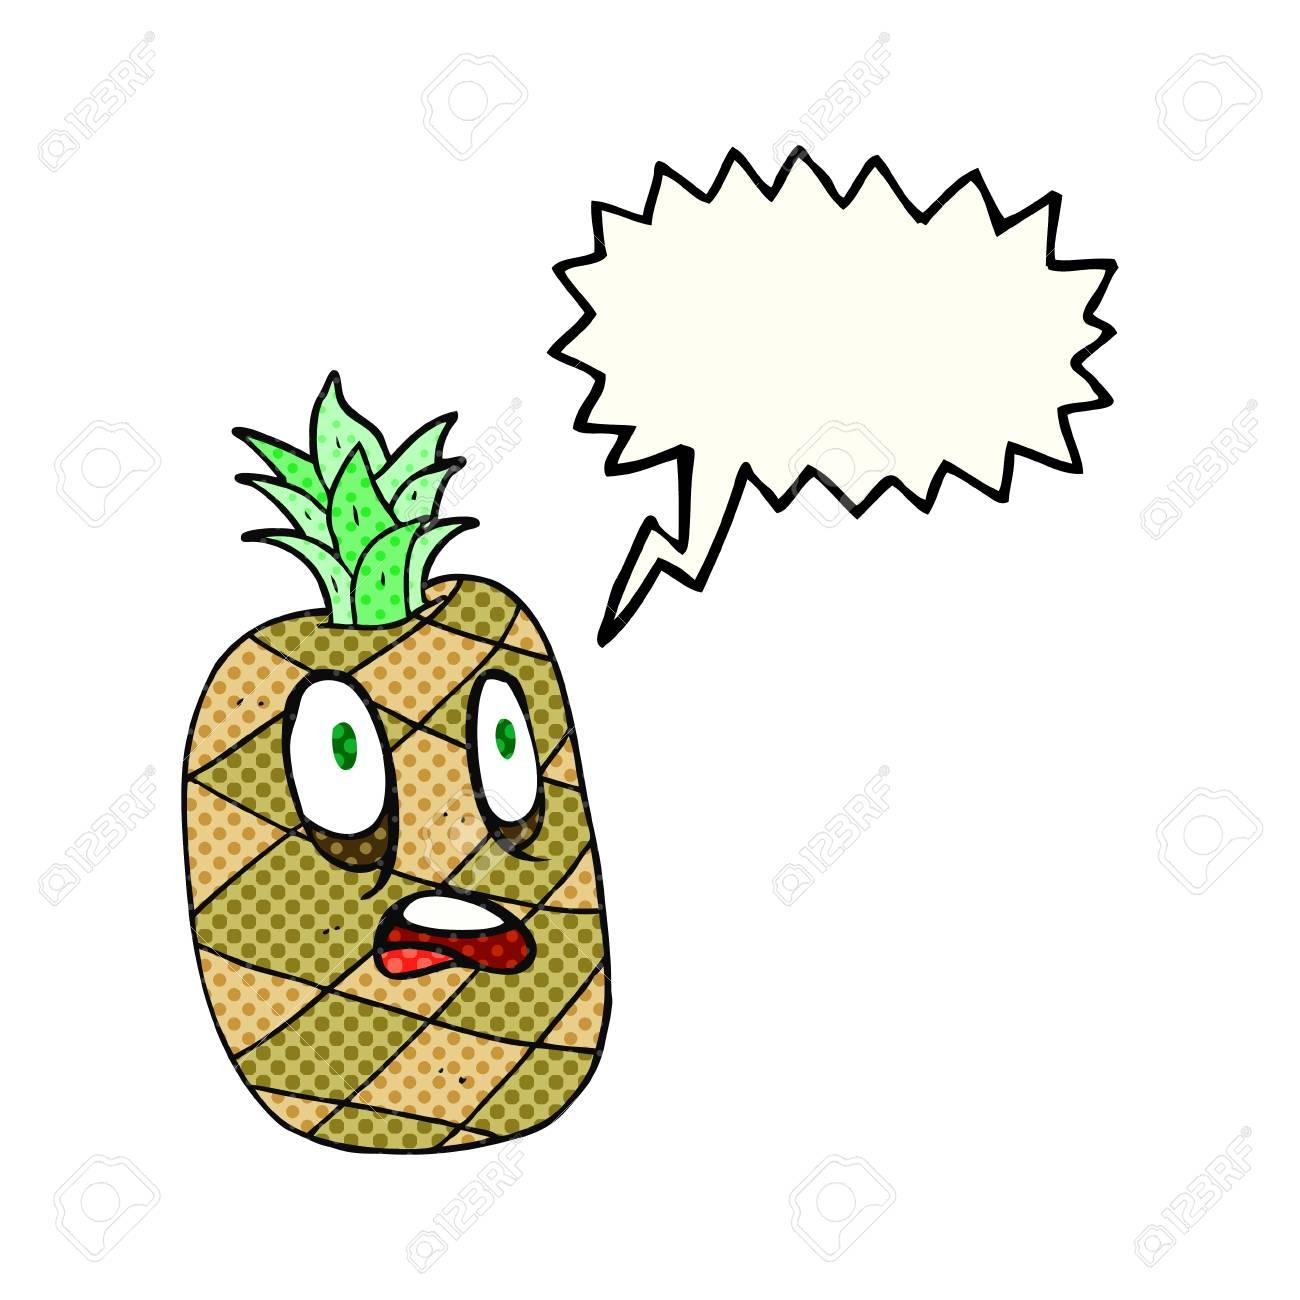 Freehand Dessinée Bande Dessinée Ananas Dessin Animé Discours Bulle